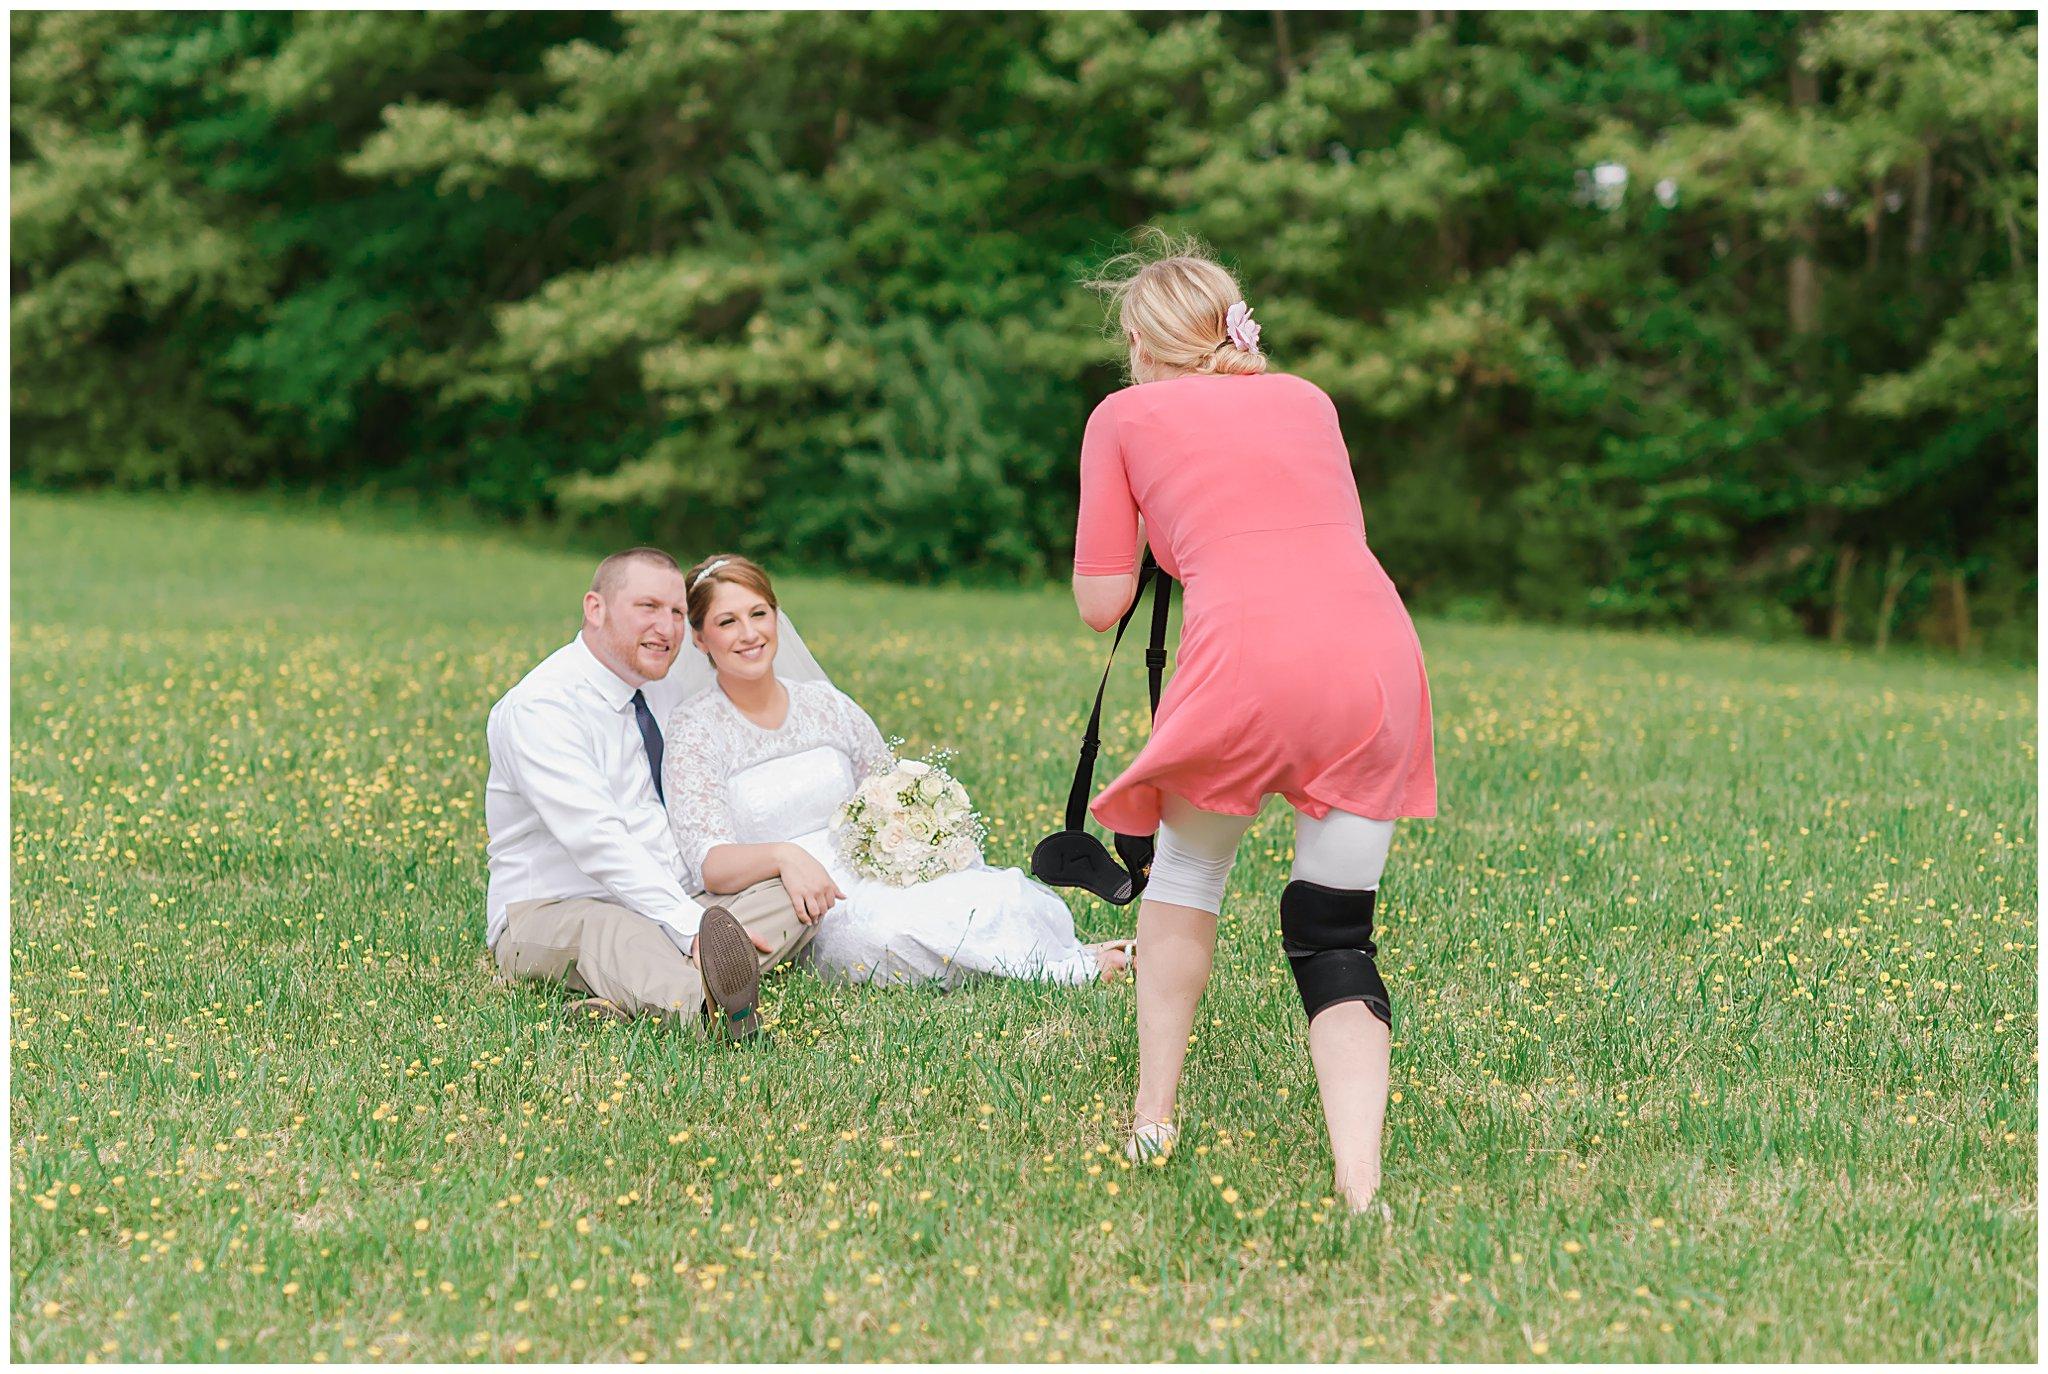 Stephanie Kopf Photography Wedding and Portrait Photographer Virginia and Charleston South Carolina_0249.jpg